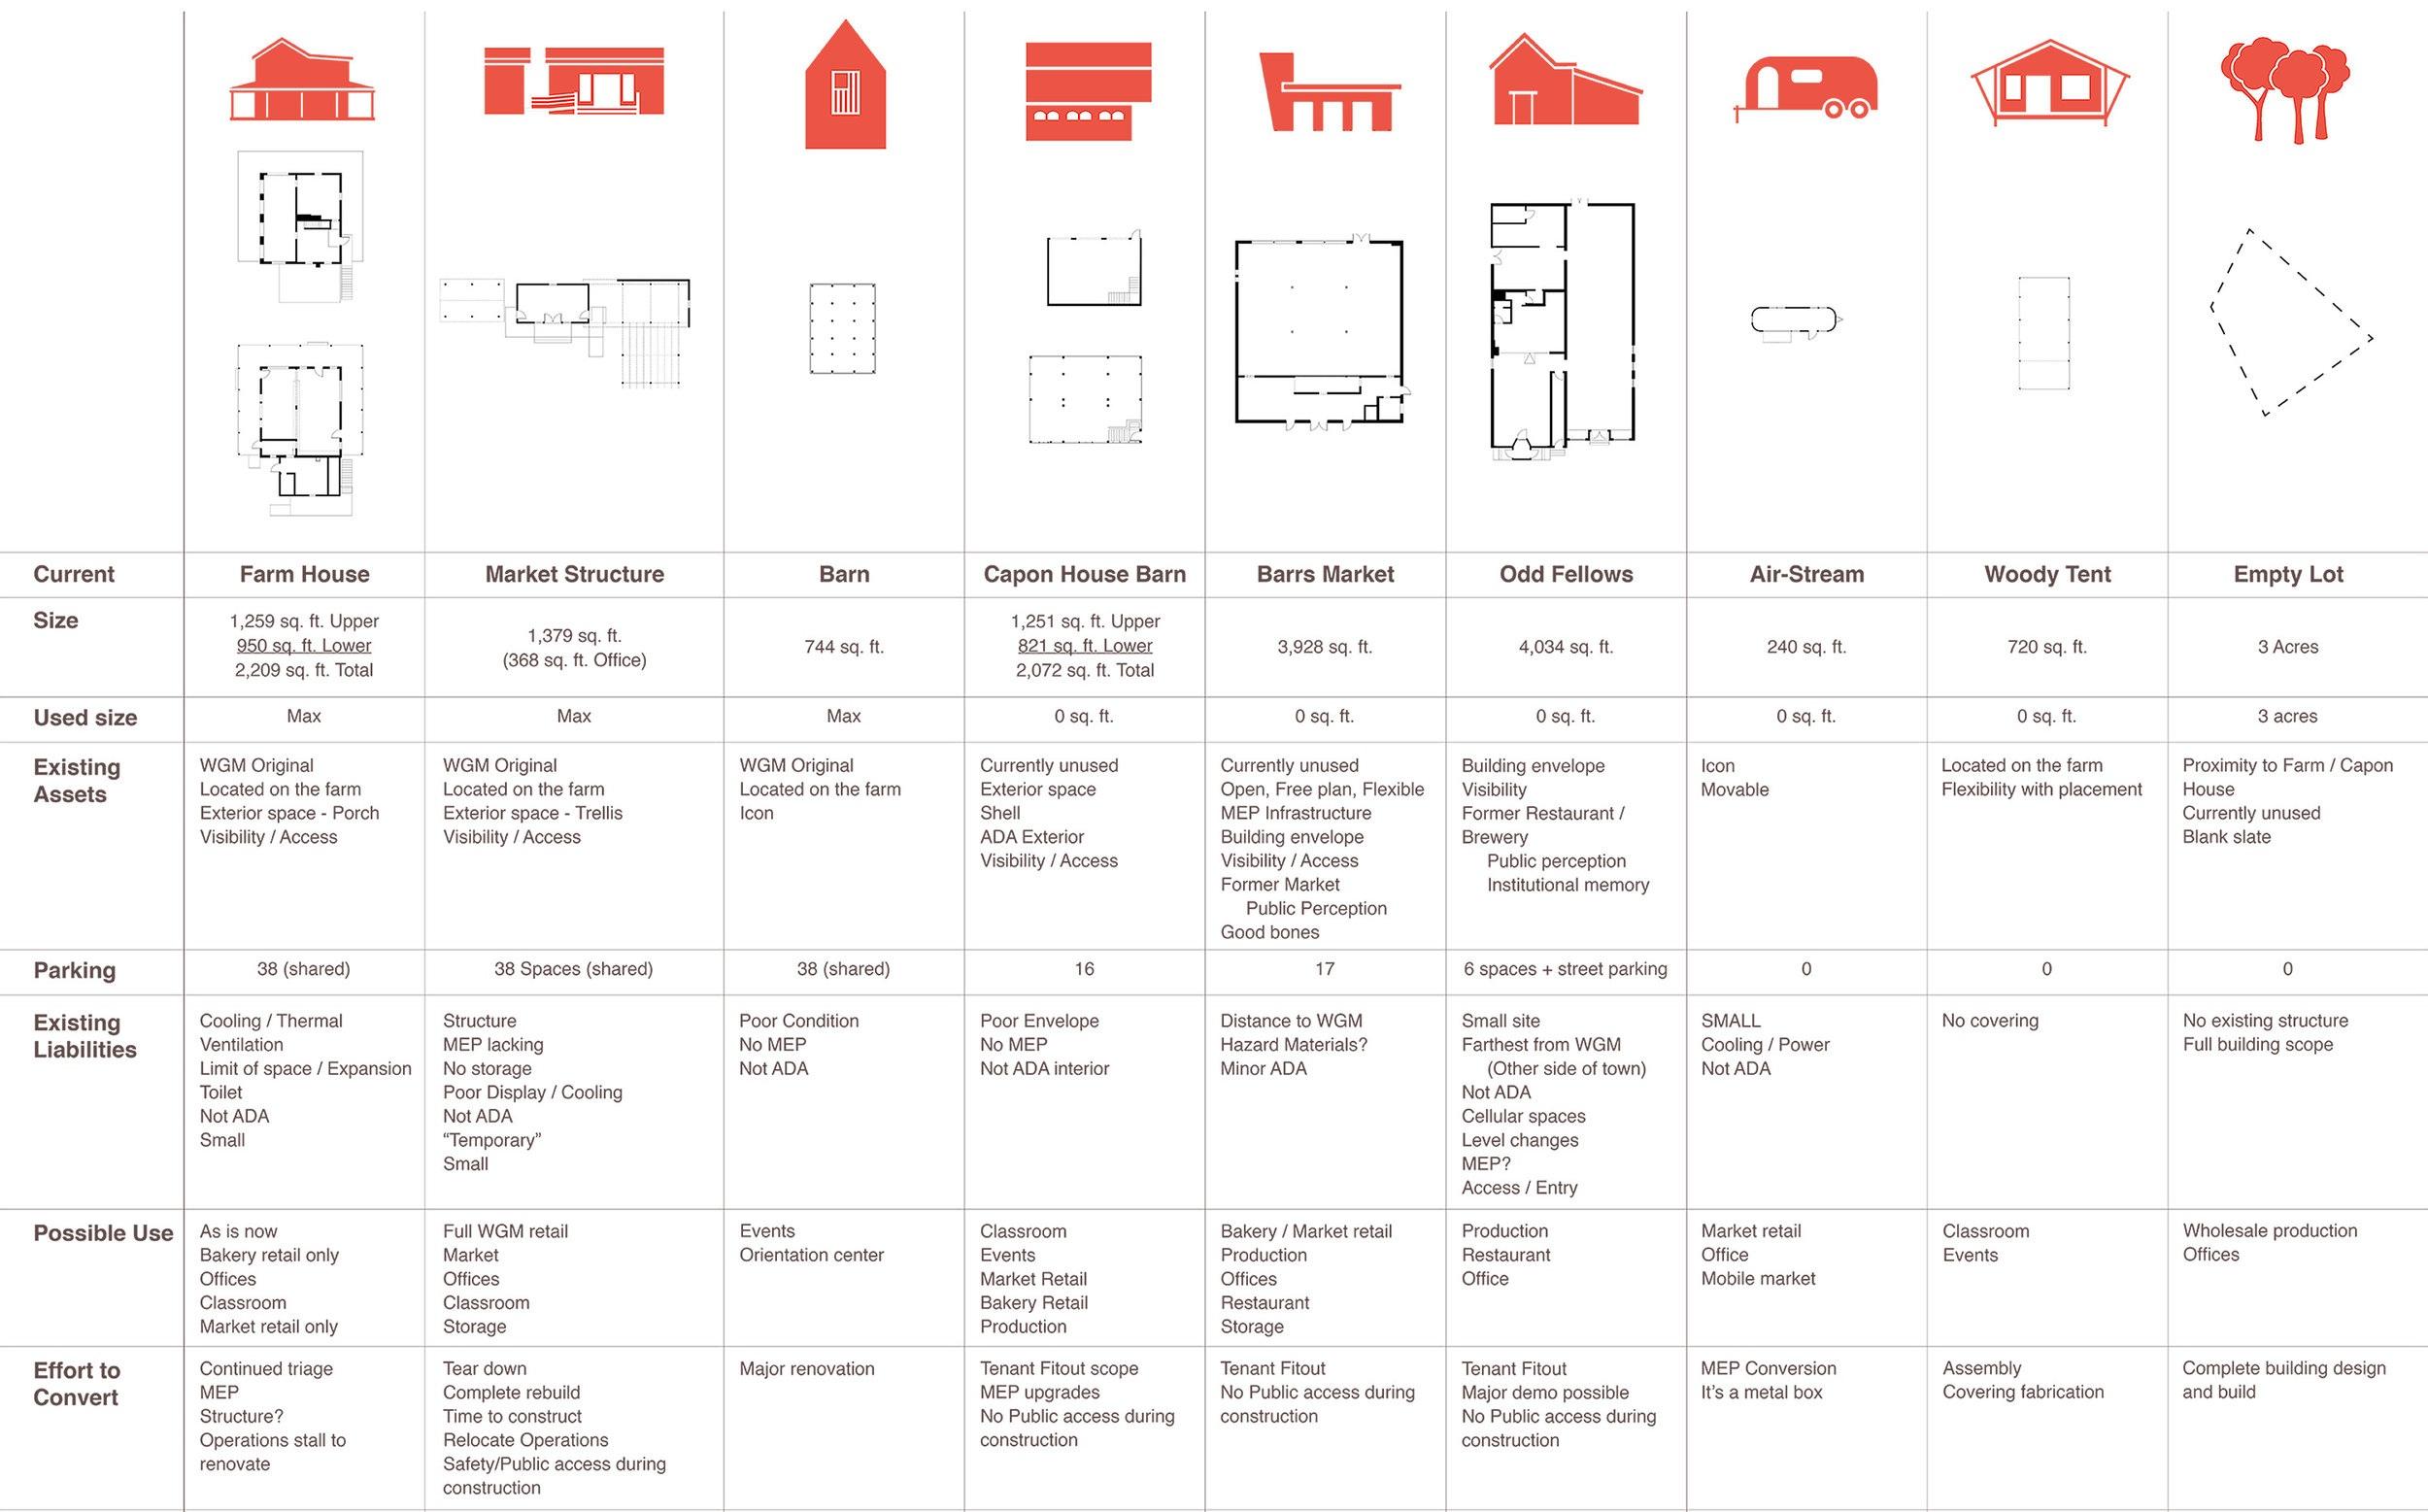 1737_DI_018+master+planning+chart-1.jpg